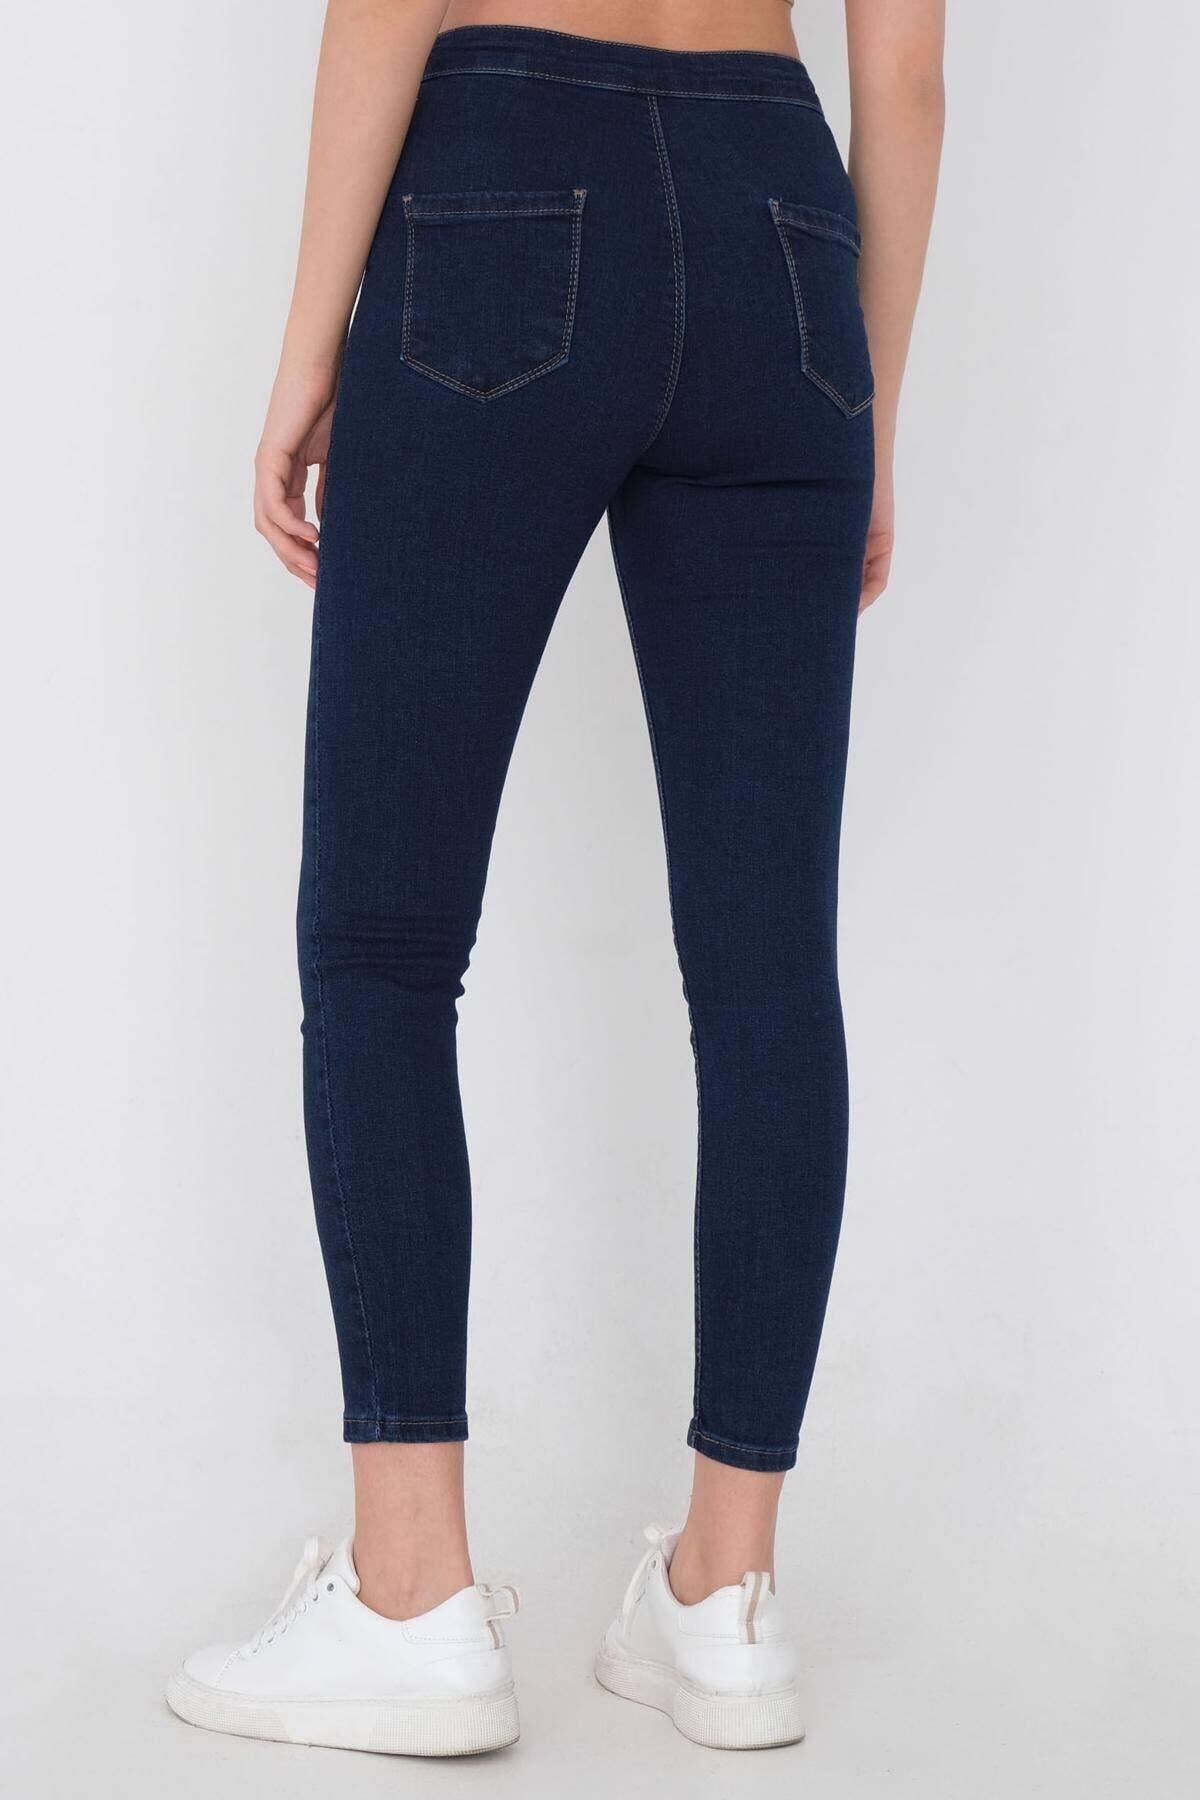 Addax Kadın Koyu Kot Rengi Yüksek Bel Pantolon Pn11178 - Pnu ADX-0000016107 4